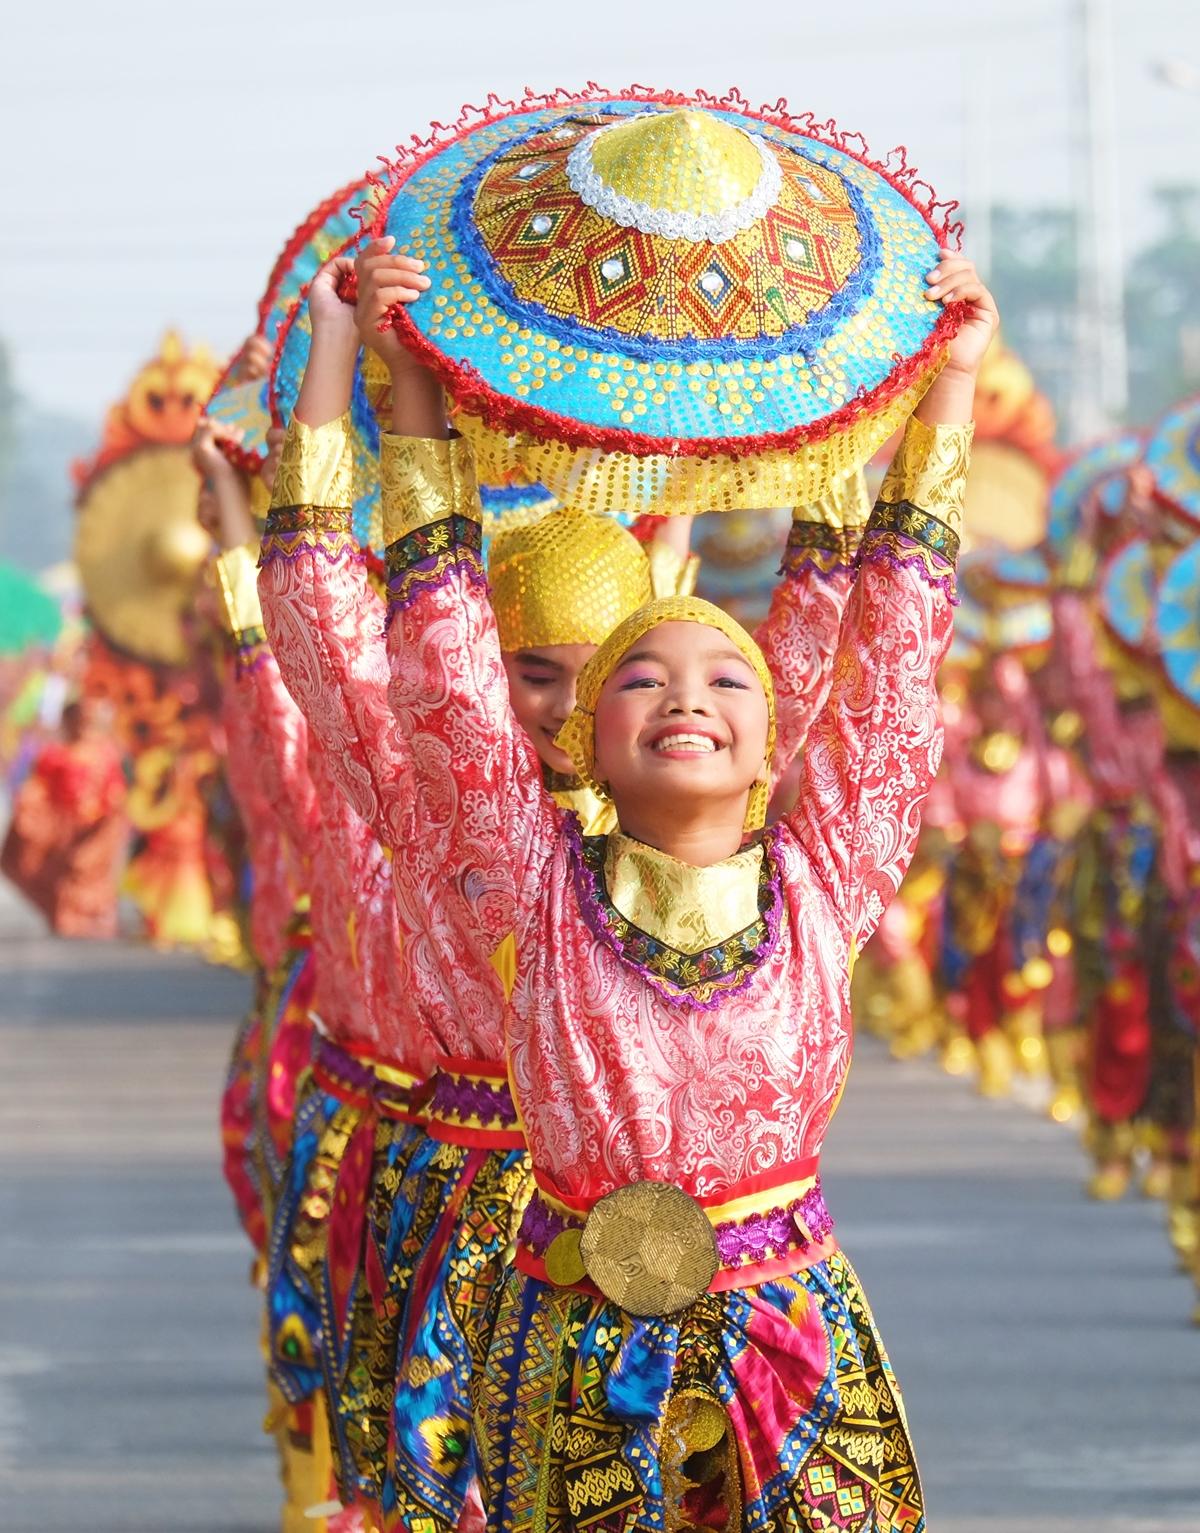 Talakudong Festival never fails to amaze!